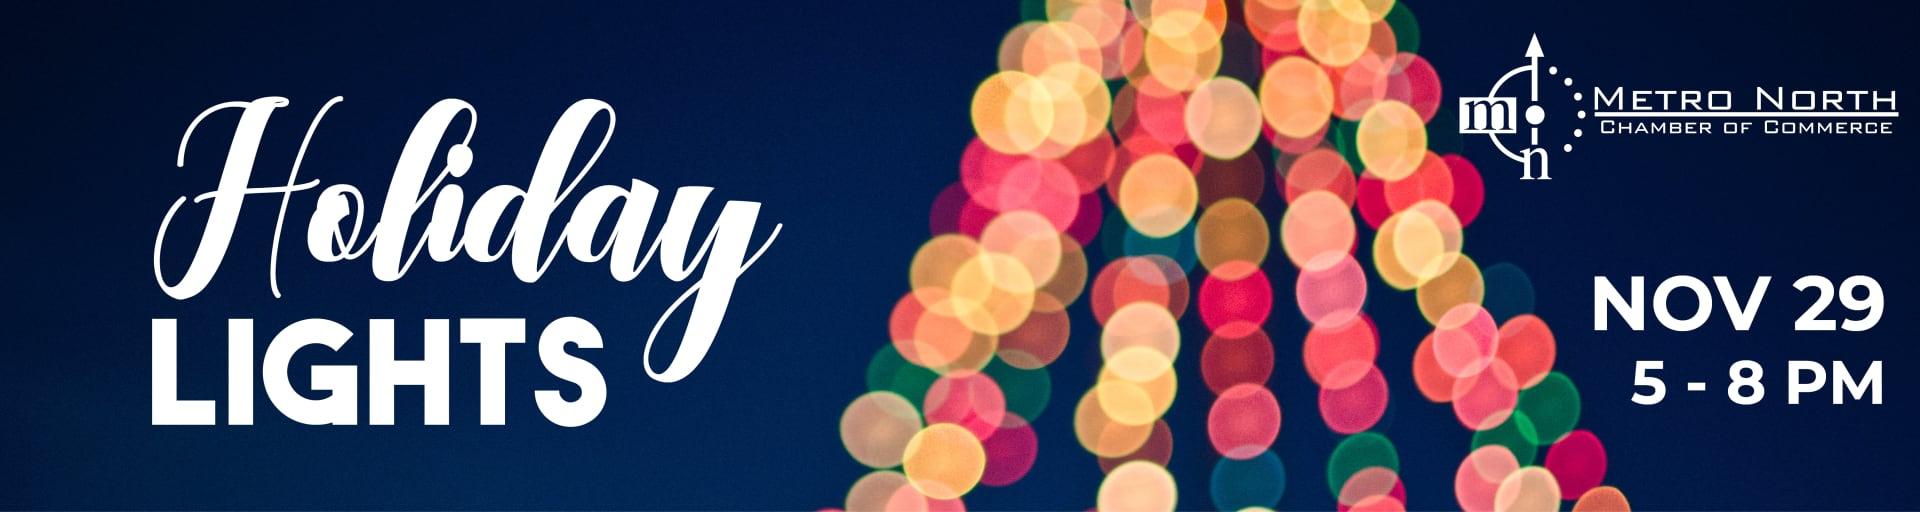 Holiday-Lights-Web-Banner(1).jpg